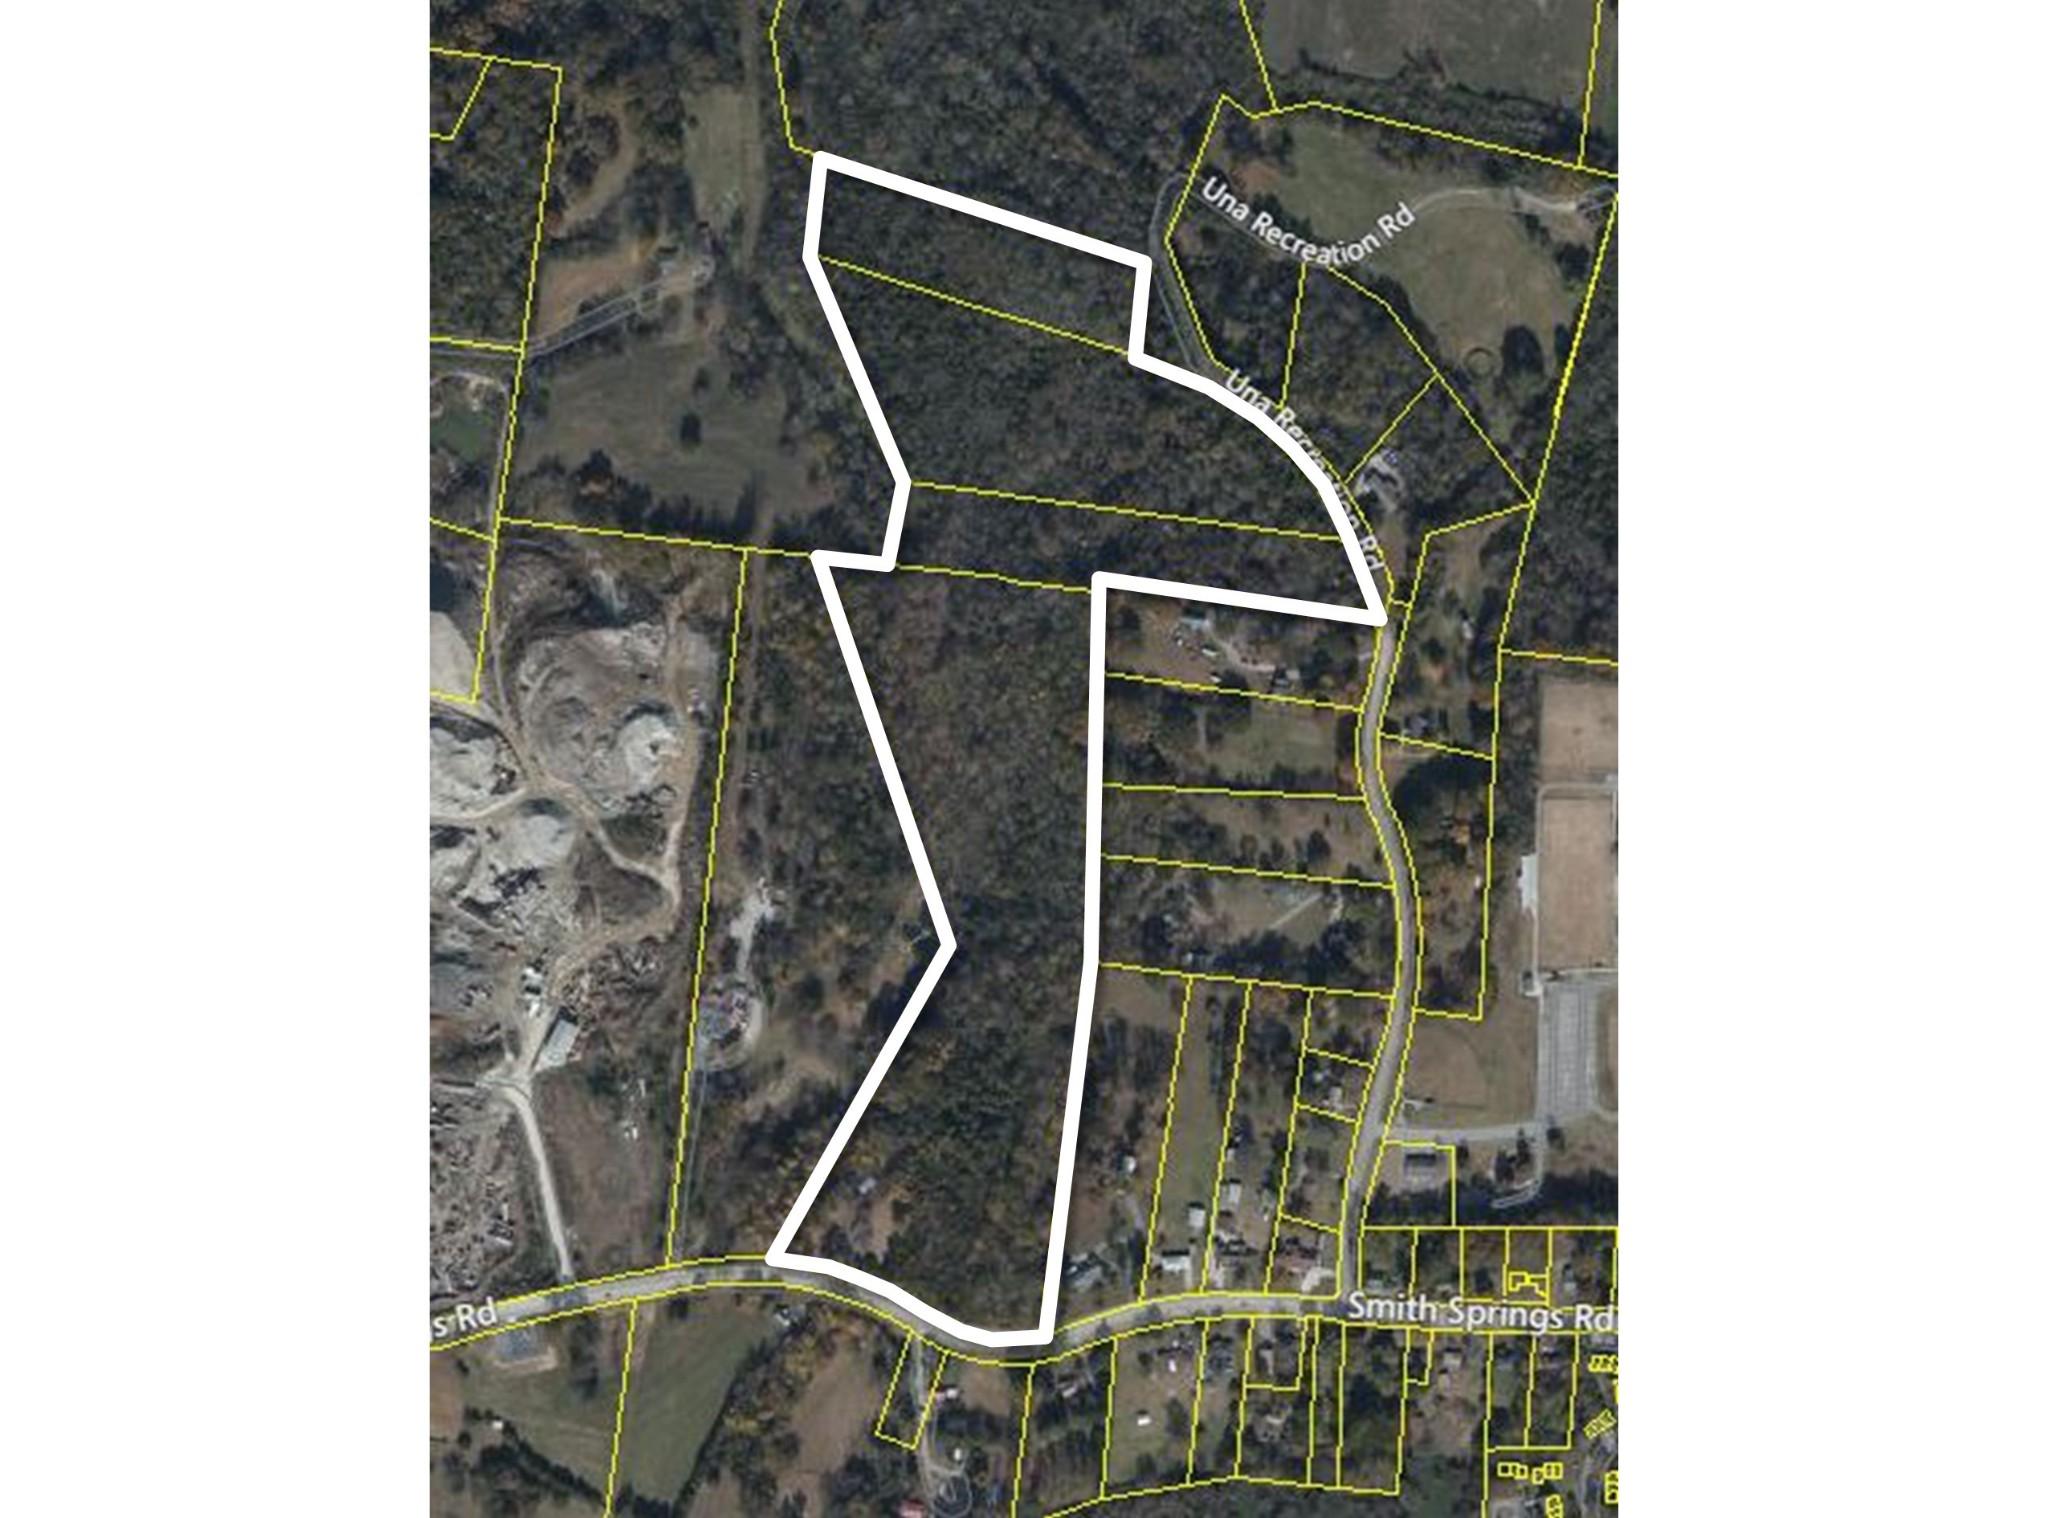 Land for sale – 2152  Smith Springs Rd   Nashville, TN